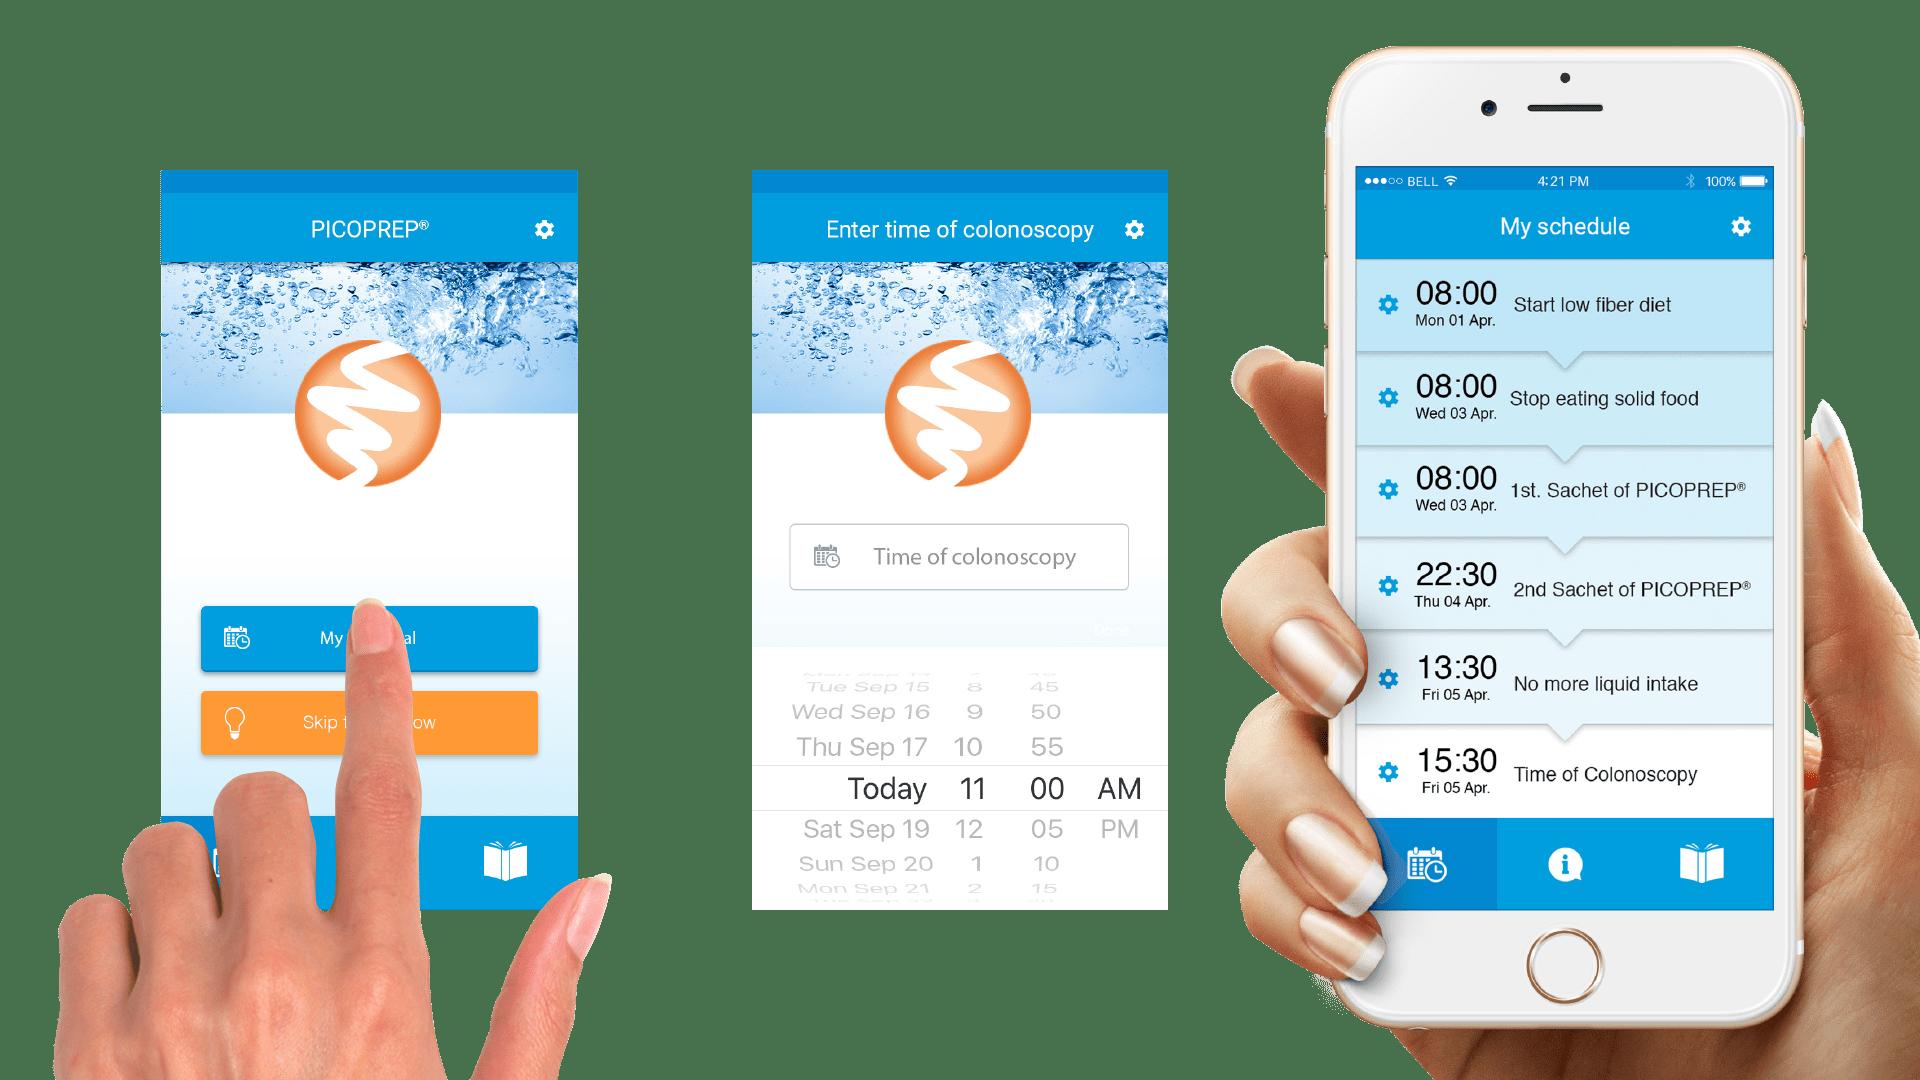 Picoprep-iPhone-app-set-time